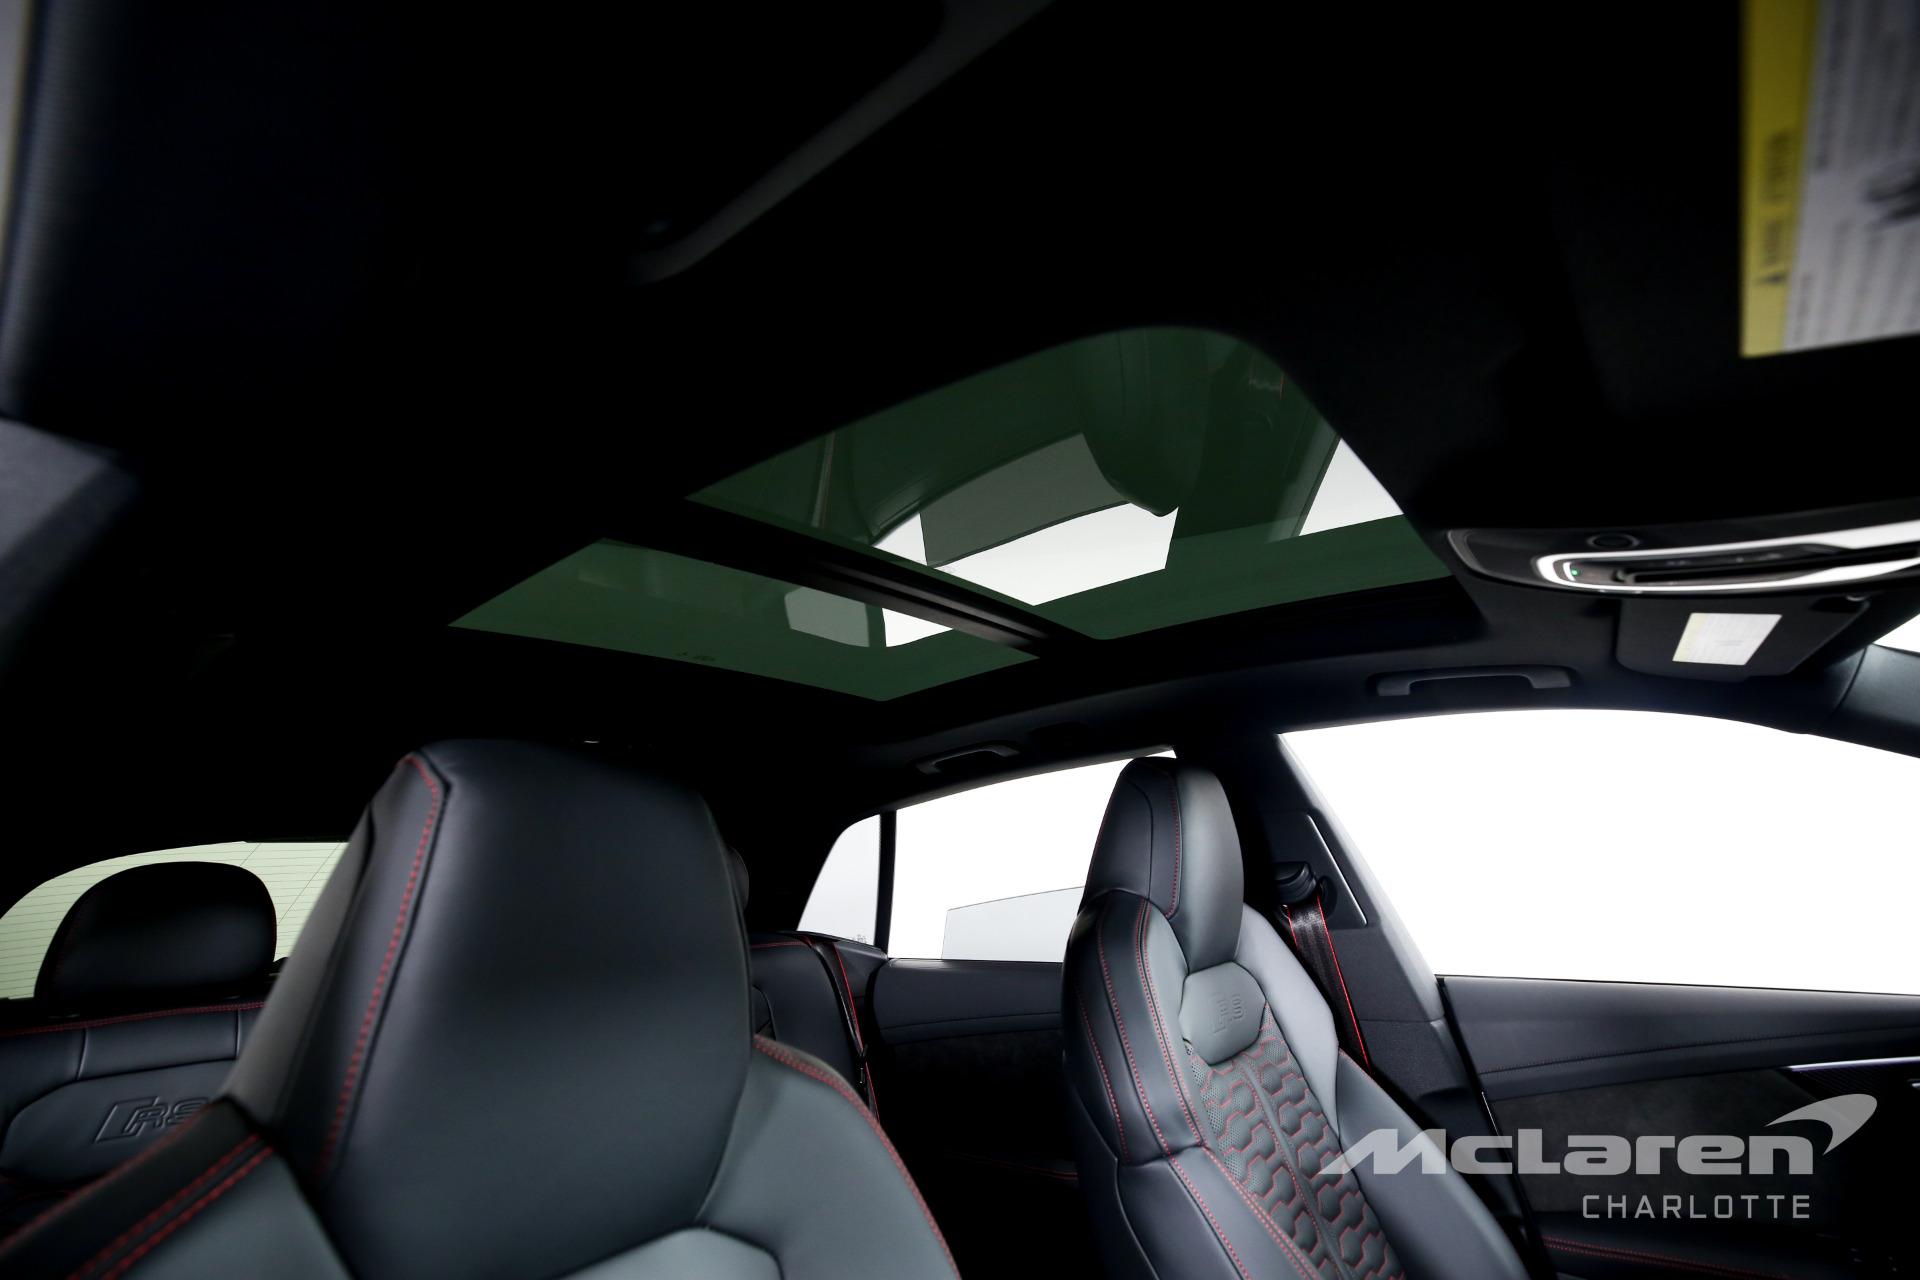 Used 2021 Audi RS Q8 4.0T quattro | Charlotte, NC